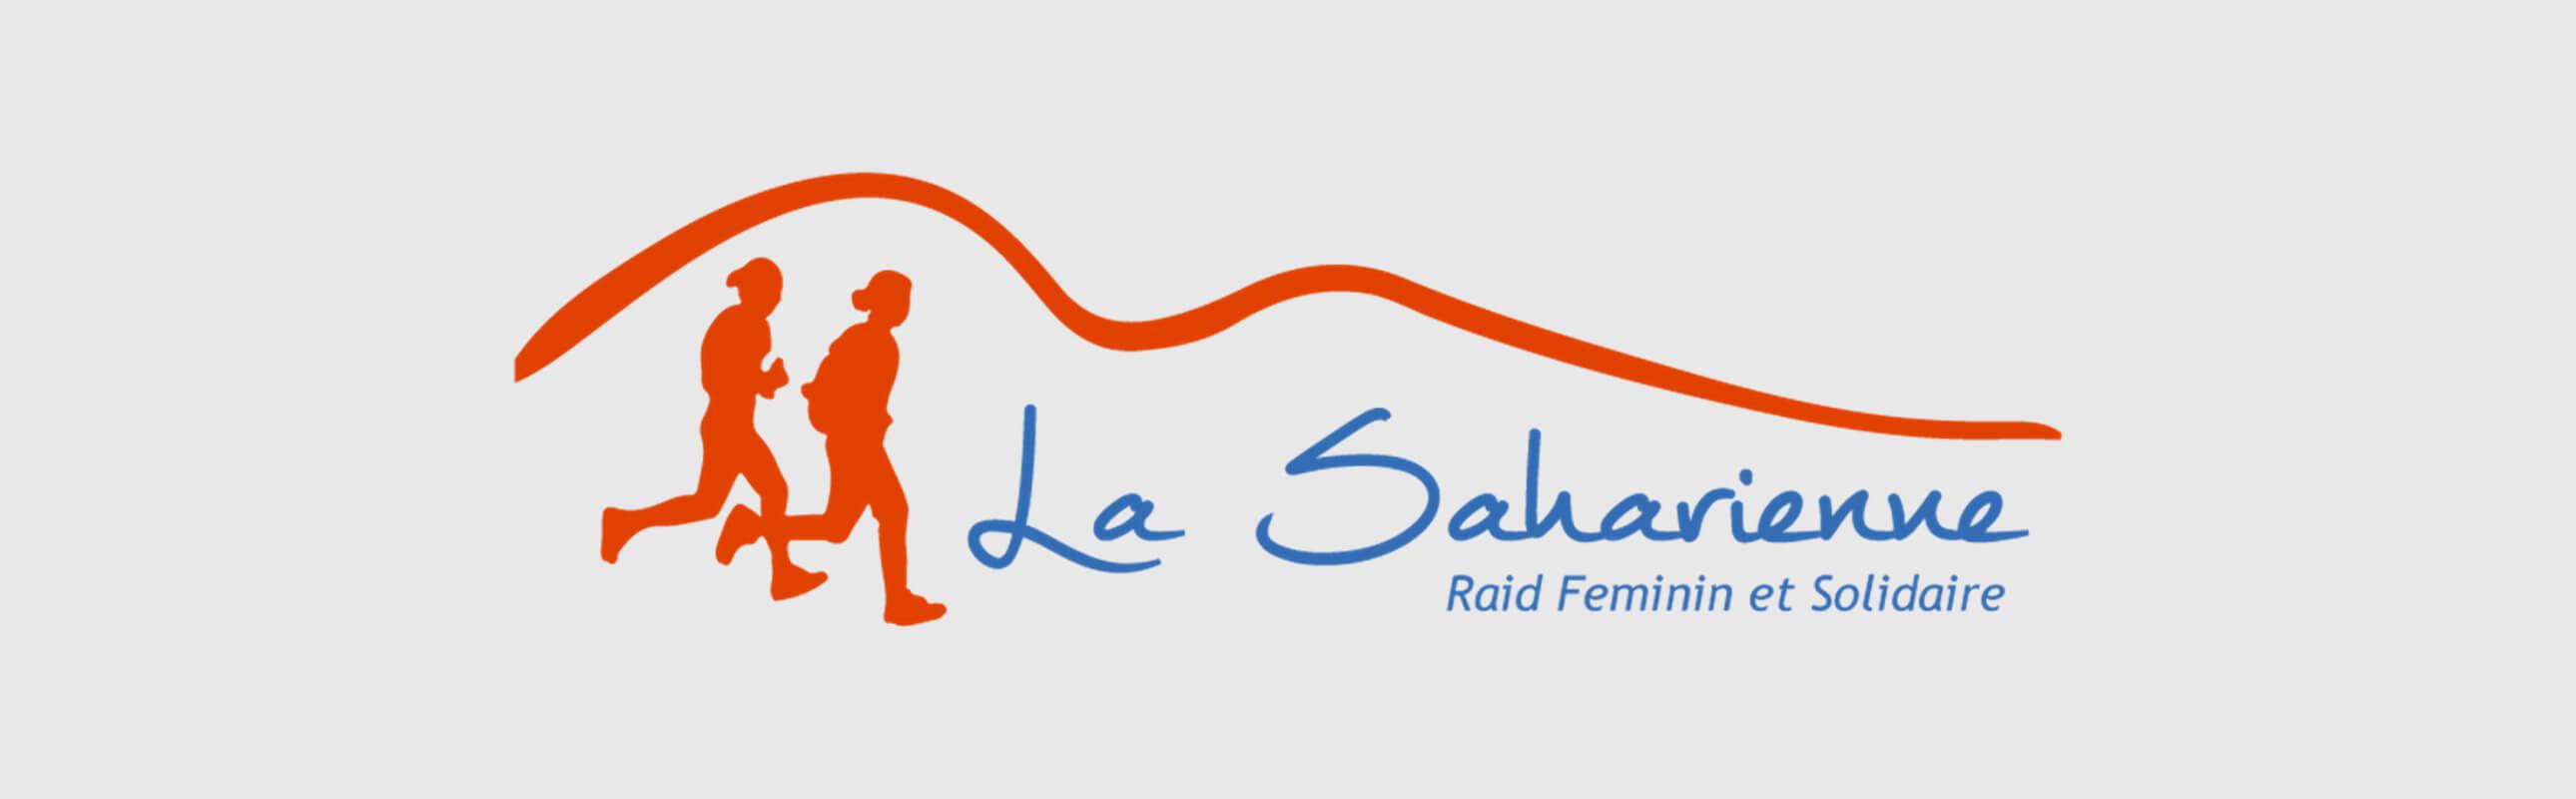 La Saharienne 2019